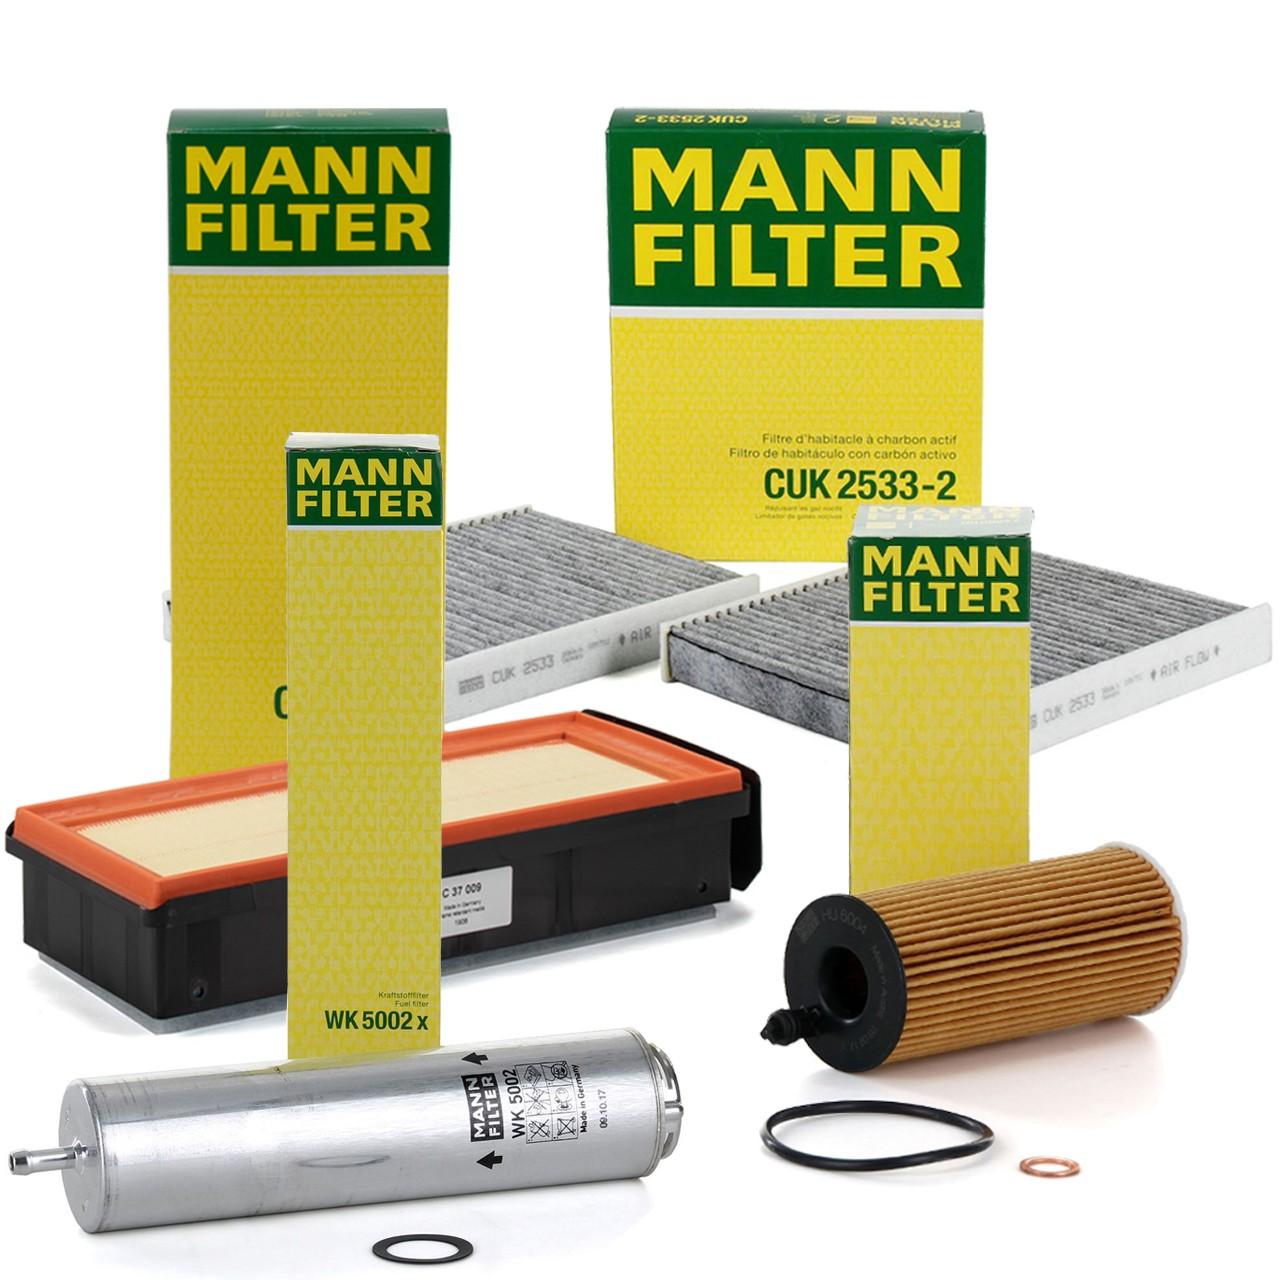 MANN Filterpaket Filterset für BMW 5er F10 F11 F07 530d 535d 6er F12 F13 640d